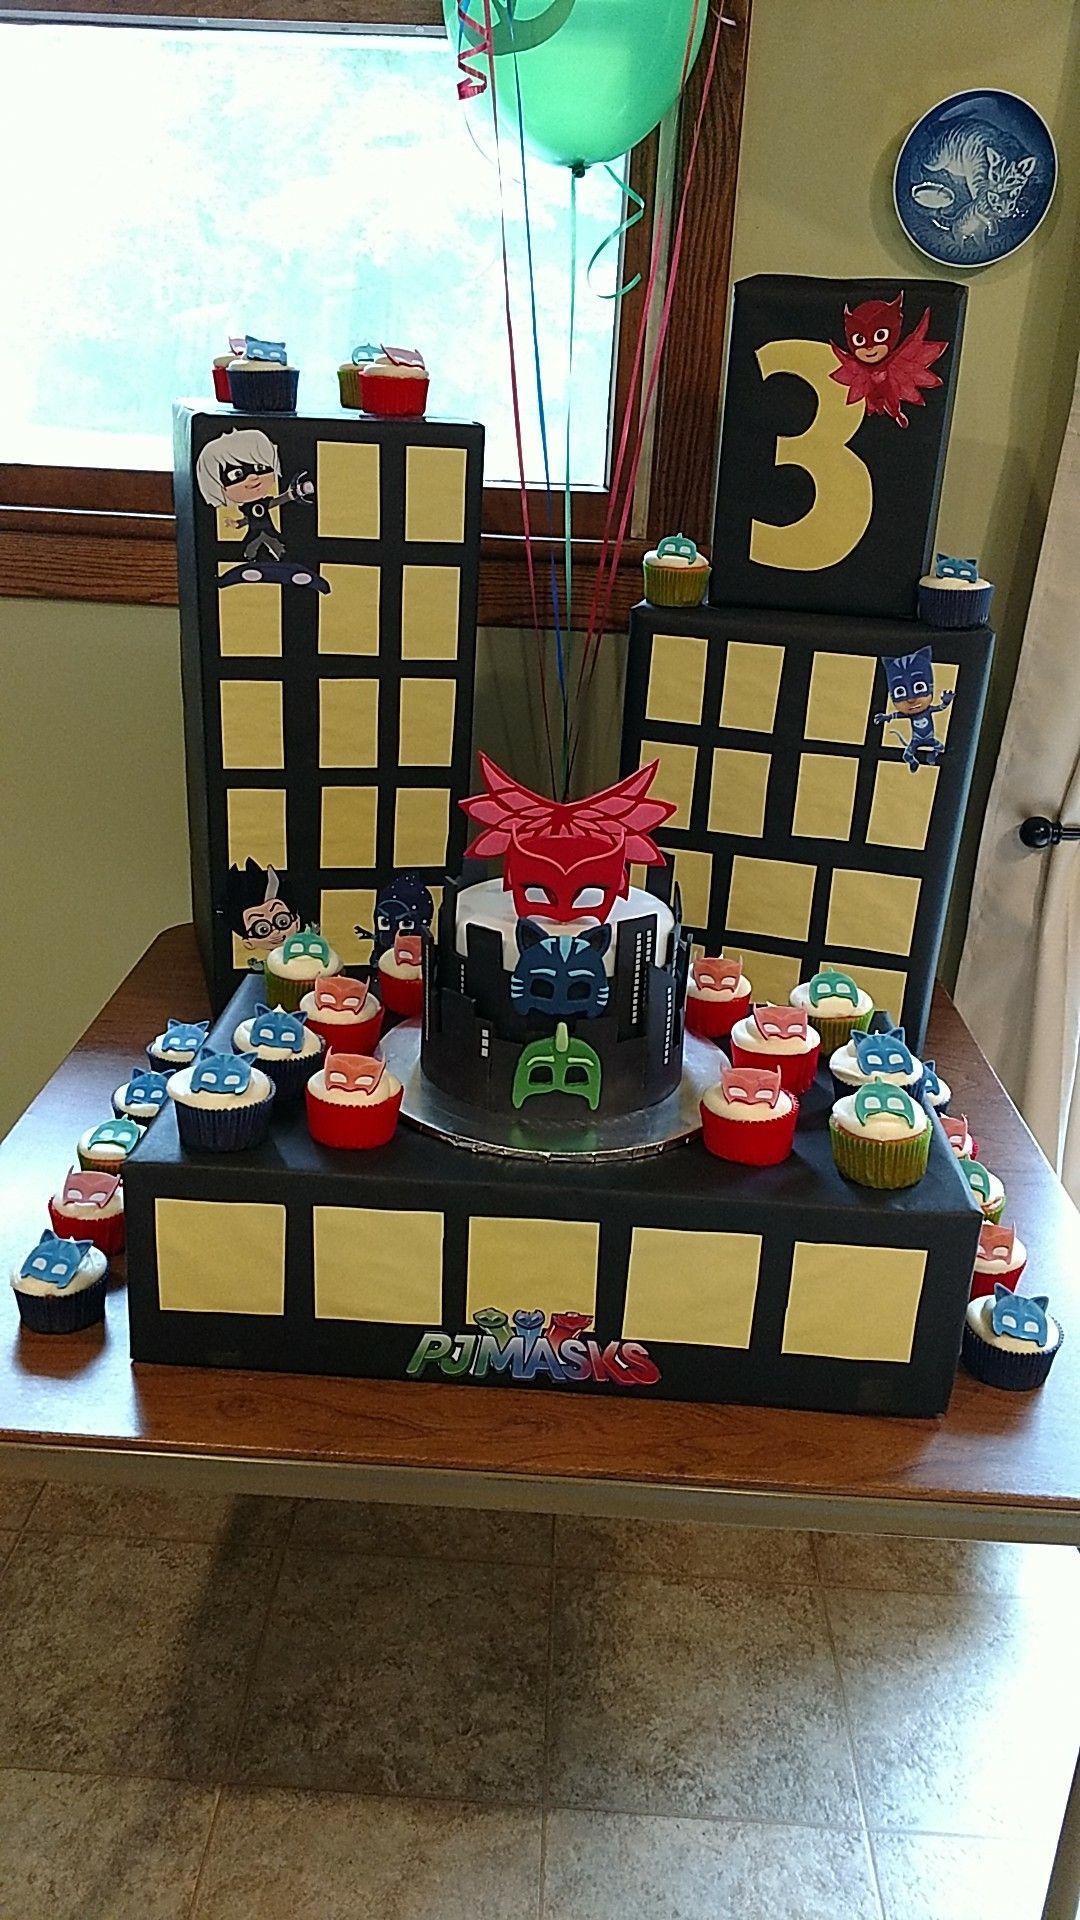 PJ Masks City Cake Display Pj Birthday 4th Cakes